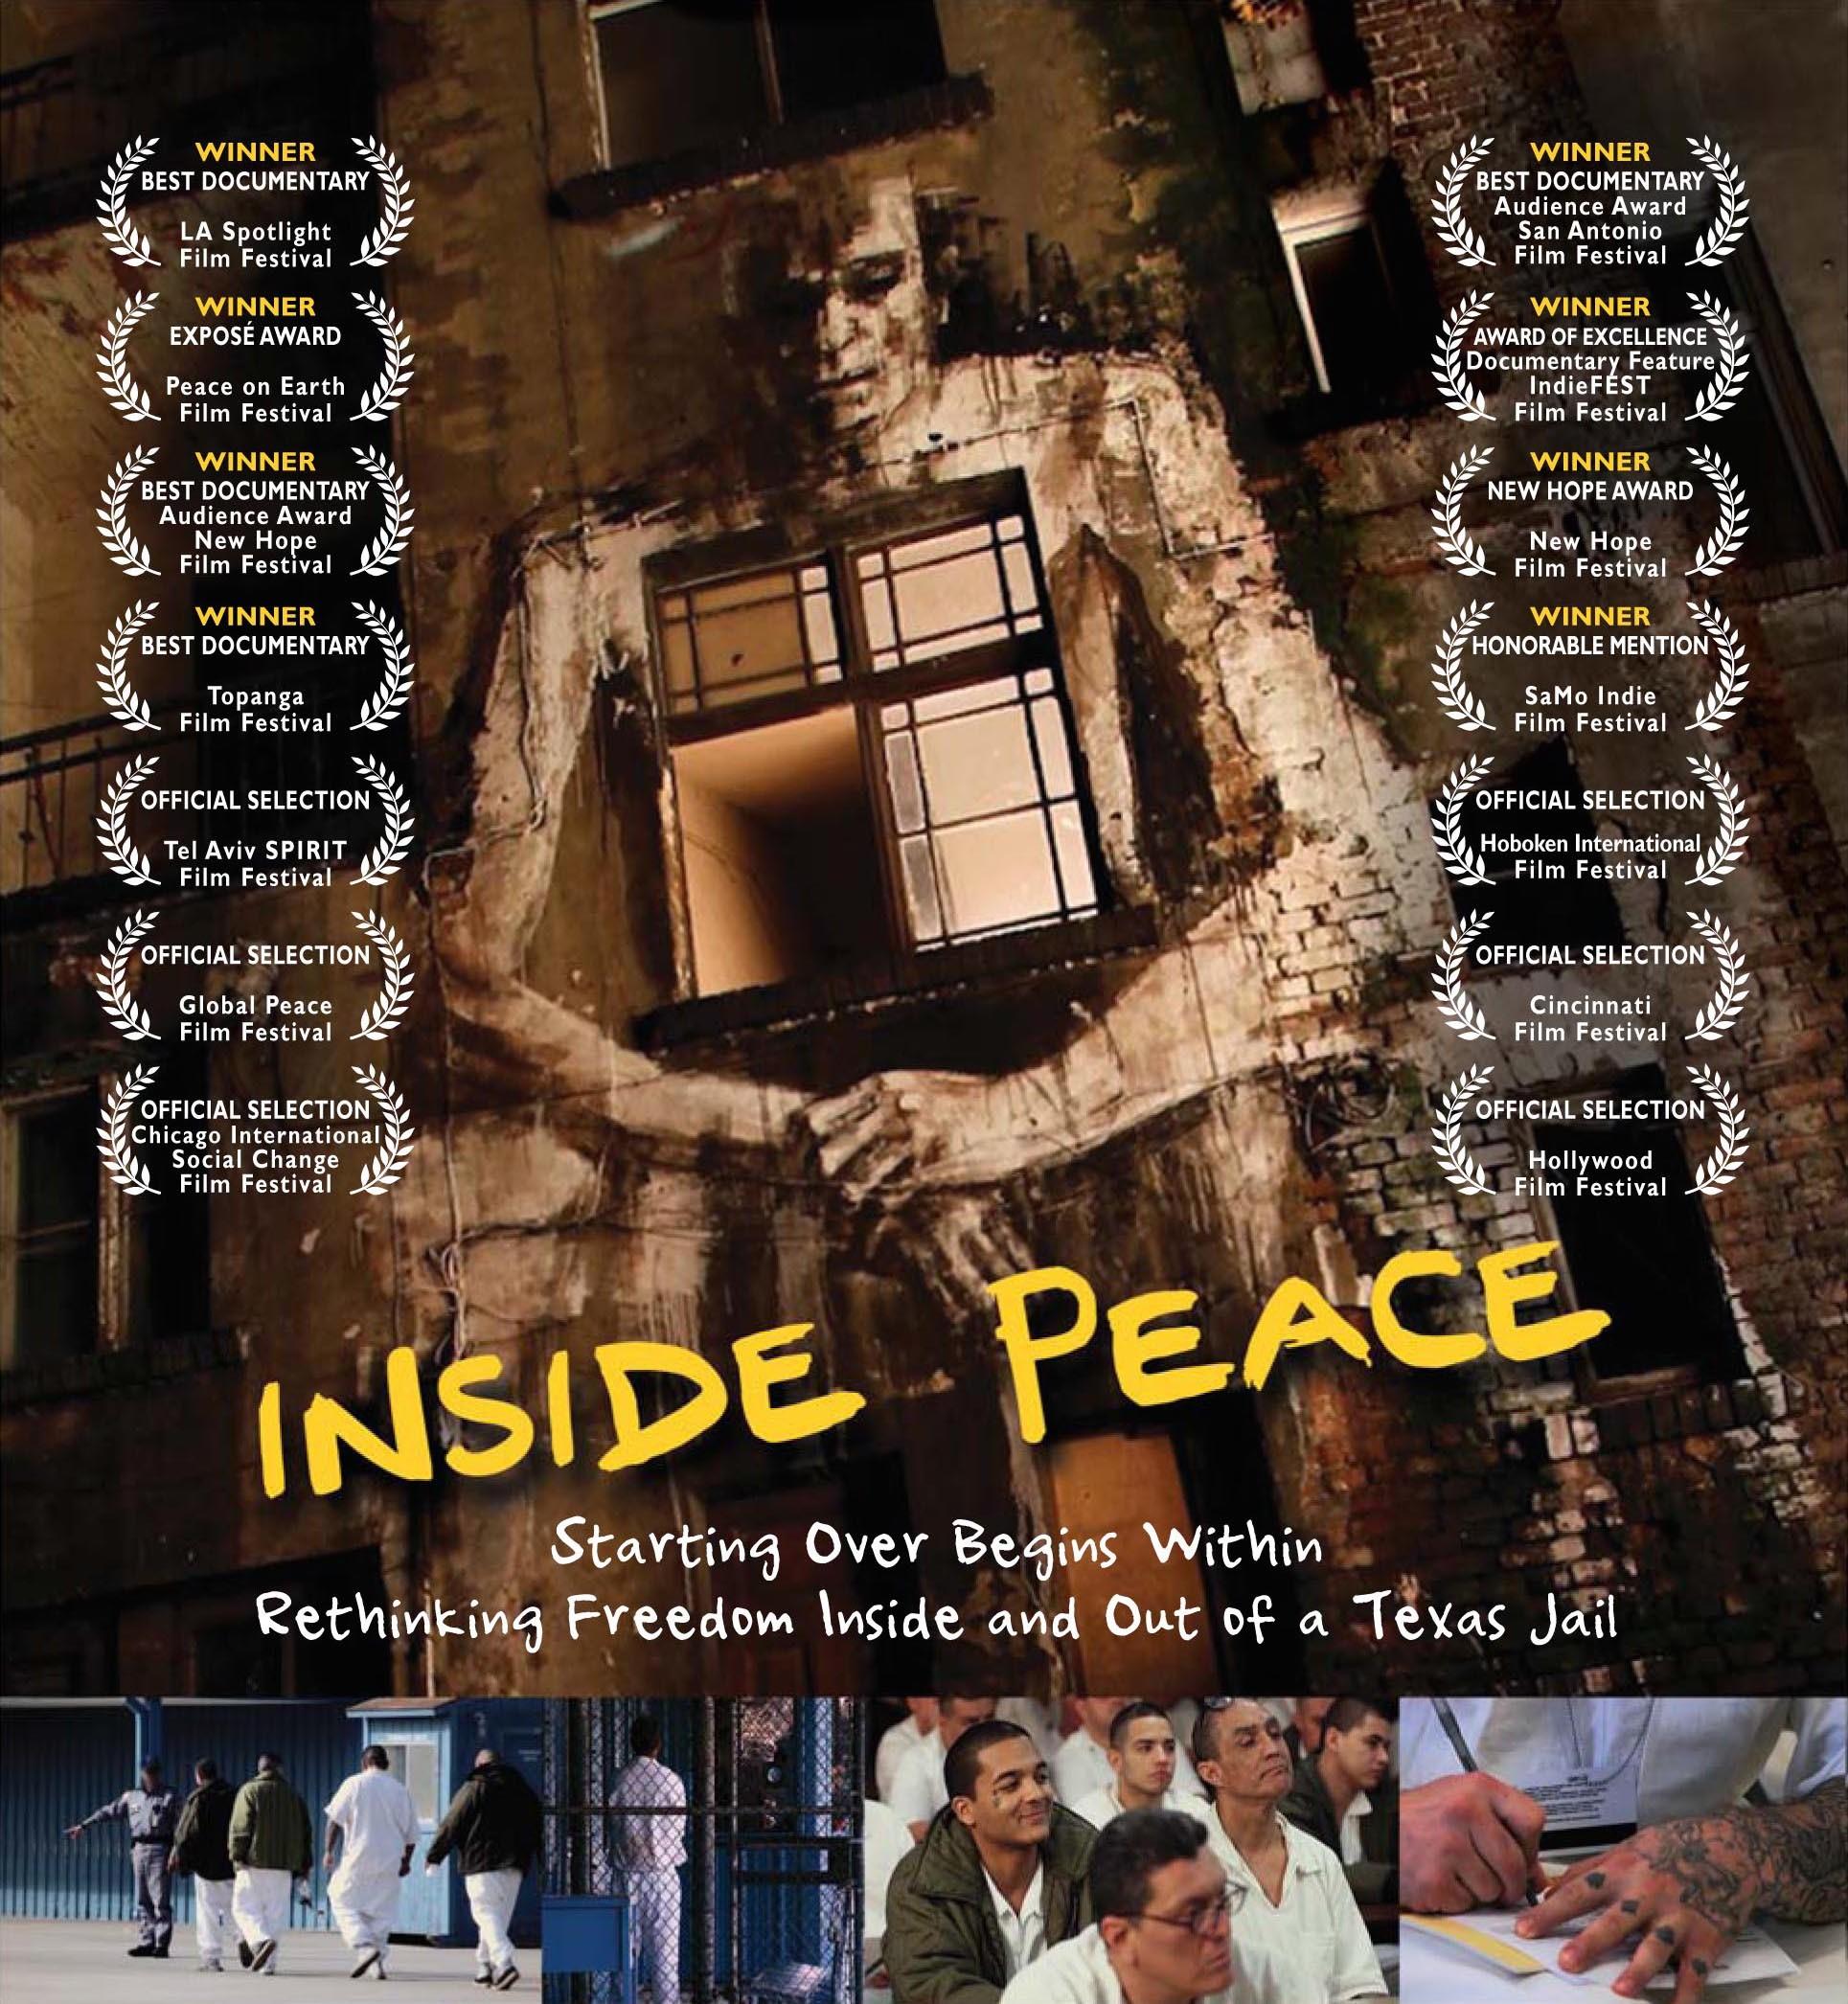 Inside Peace documentary screening